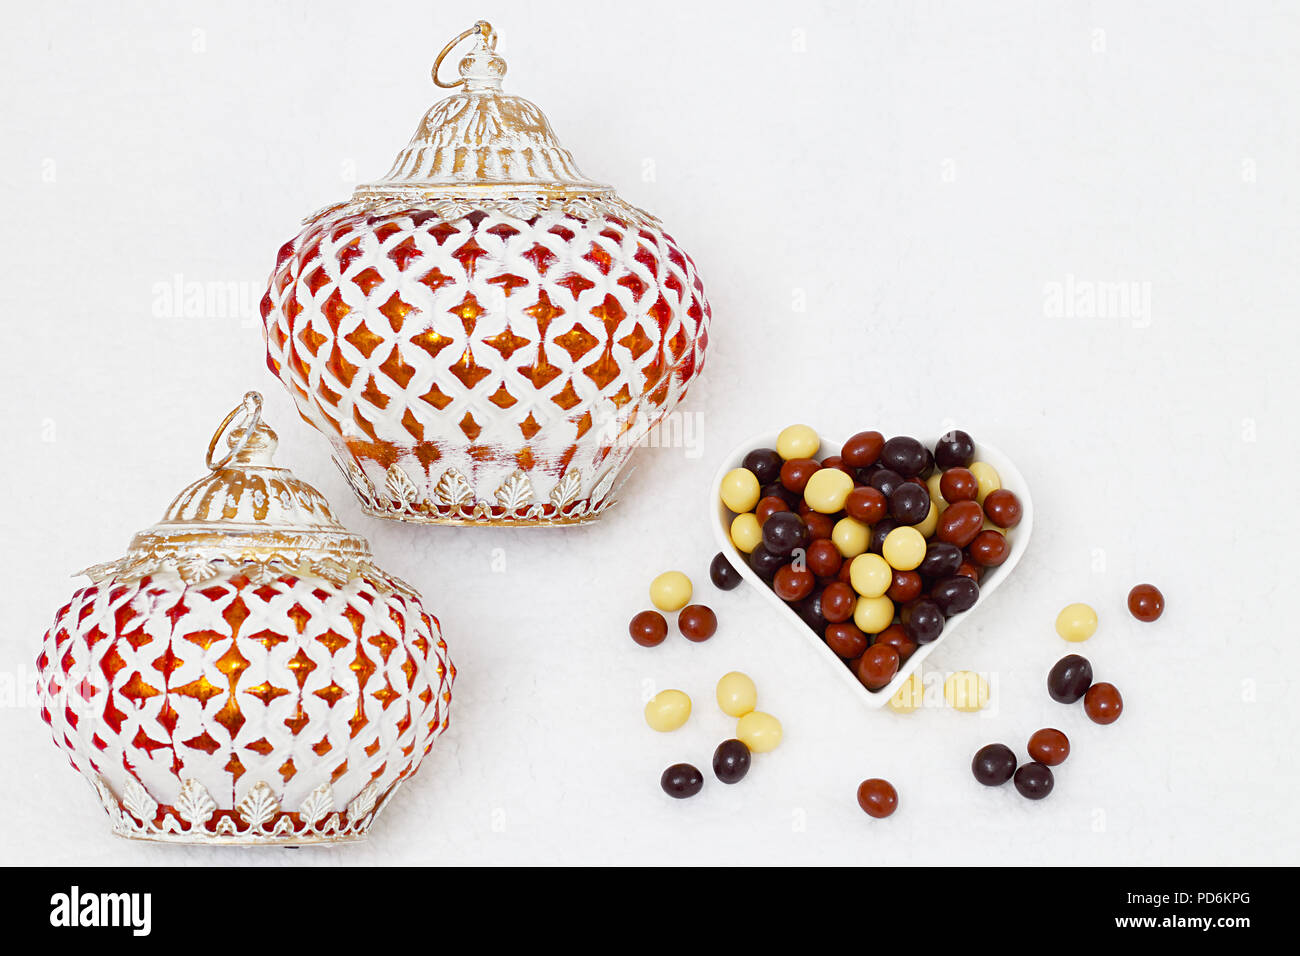 Eid Mubarak greeting with Eid Al Adha sacrifice festival, Islamic ...